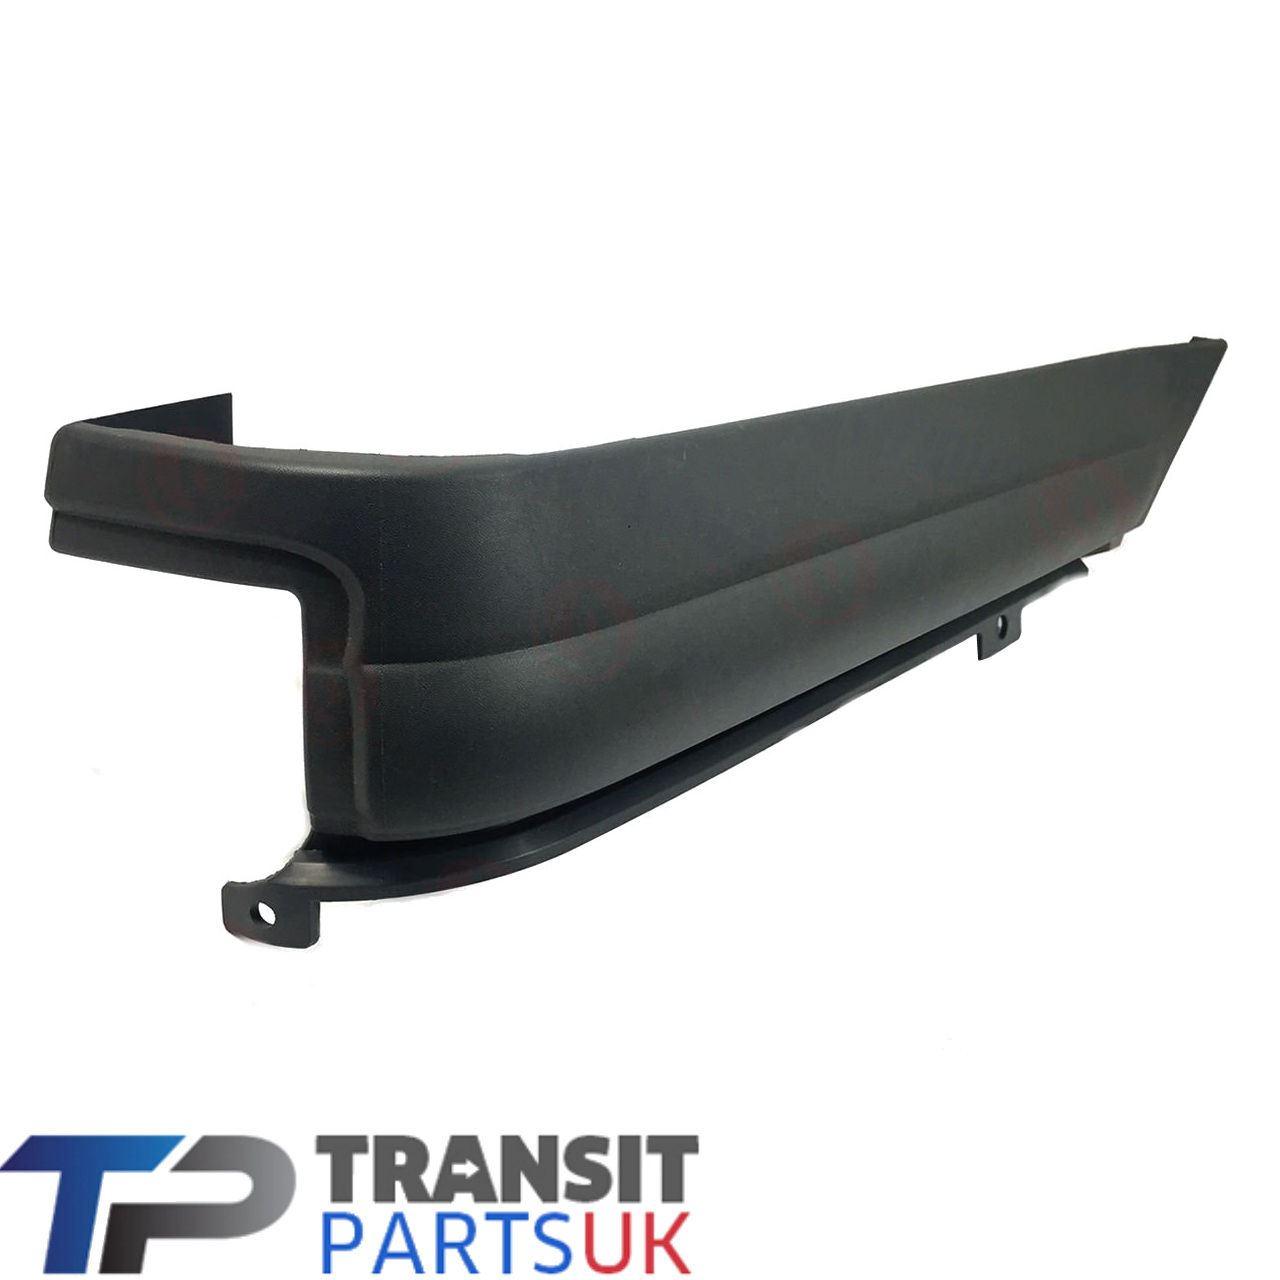 Transit Parts Transit MK6 MK7 Rear Bumper Cover Trim Pad Panel 2000-2014